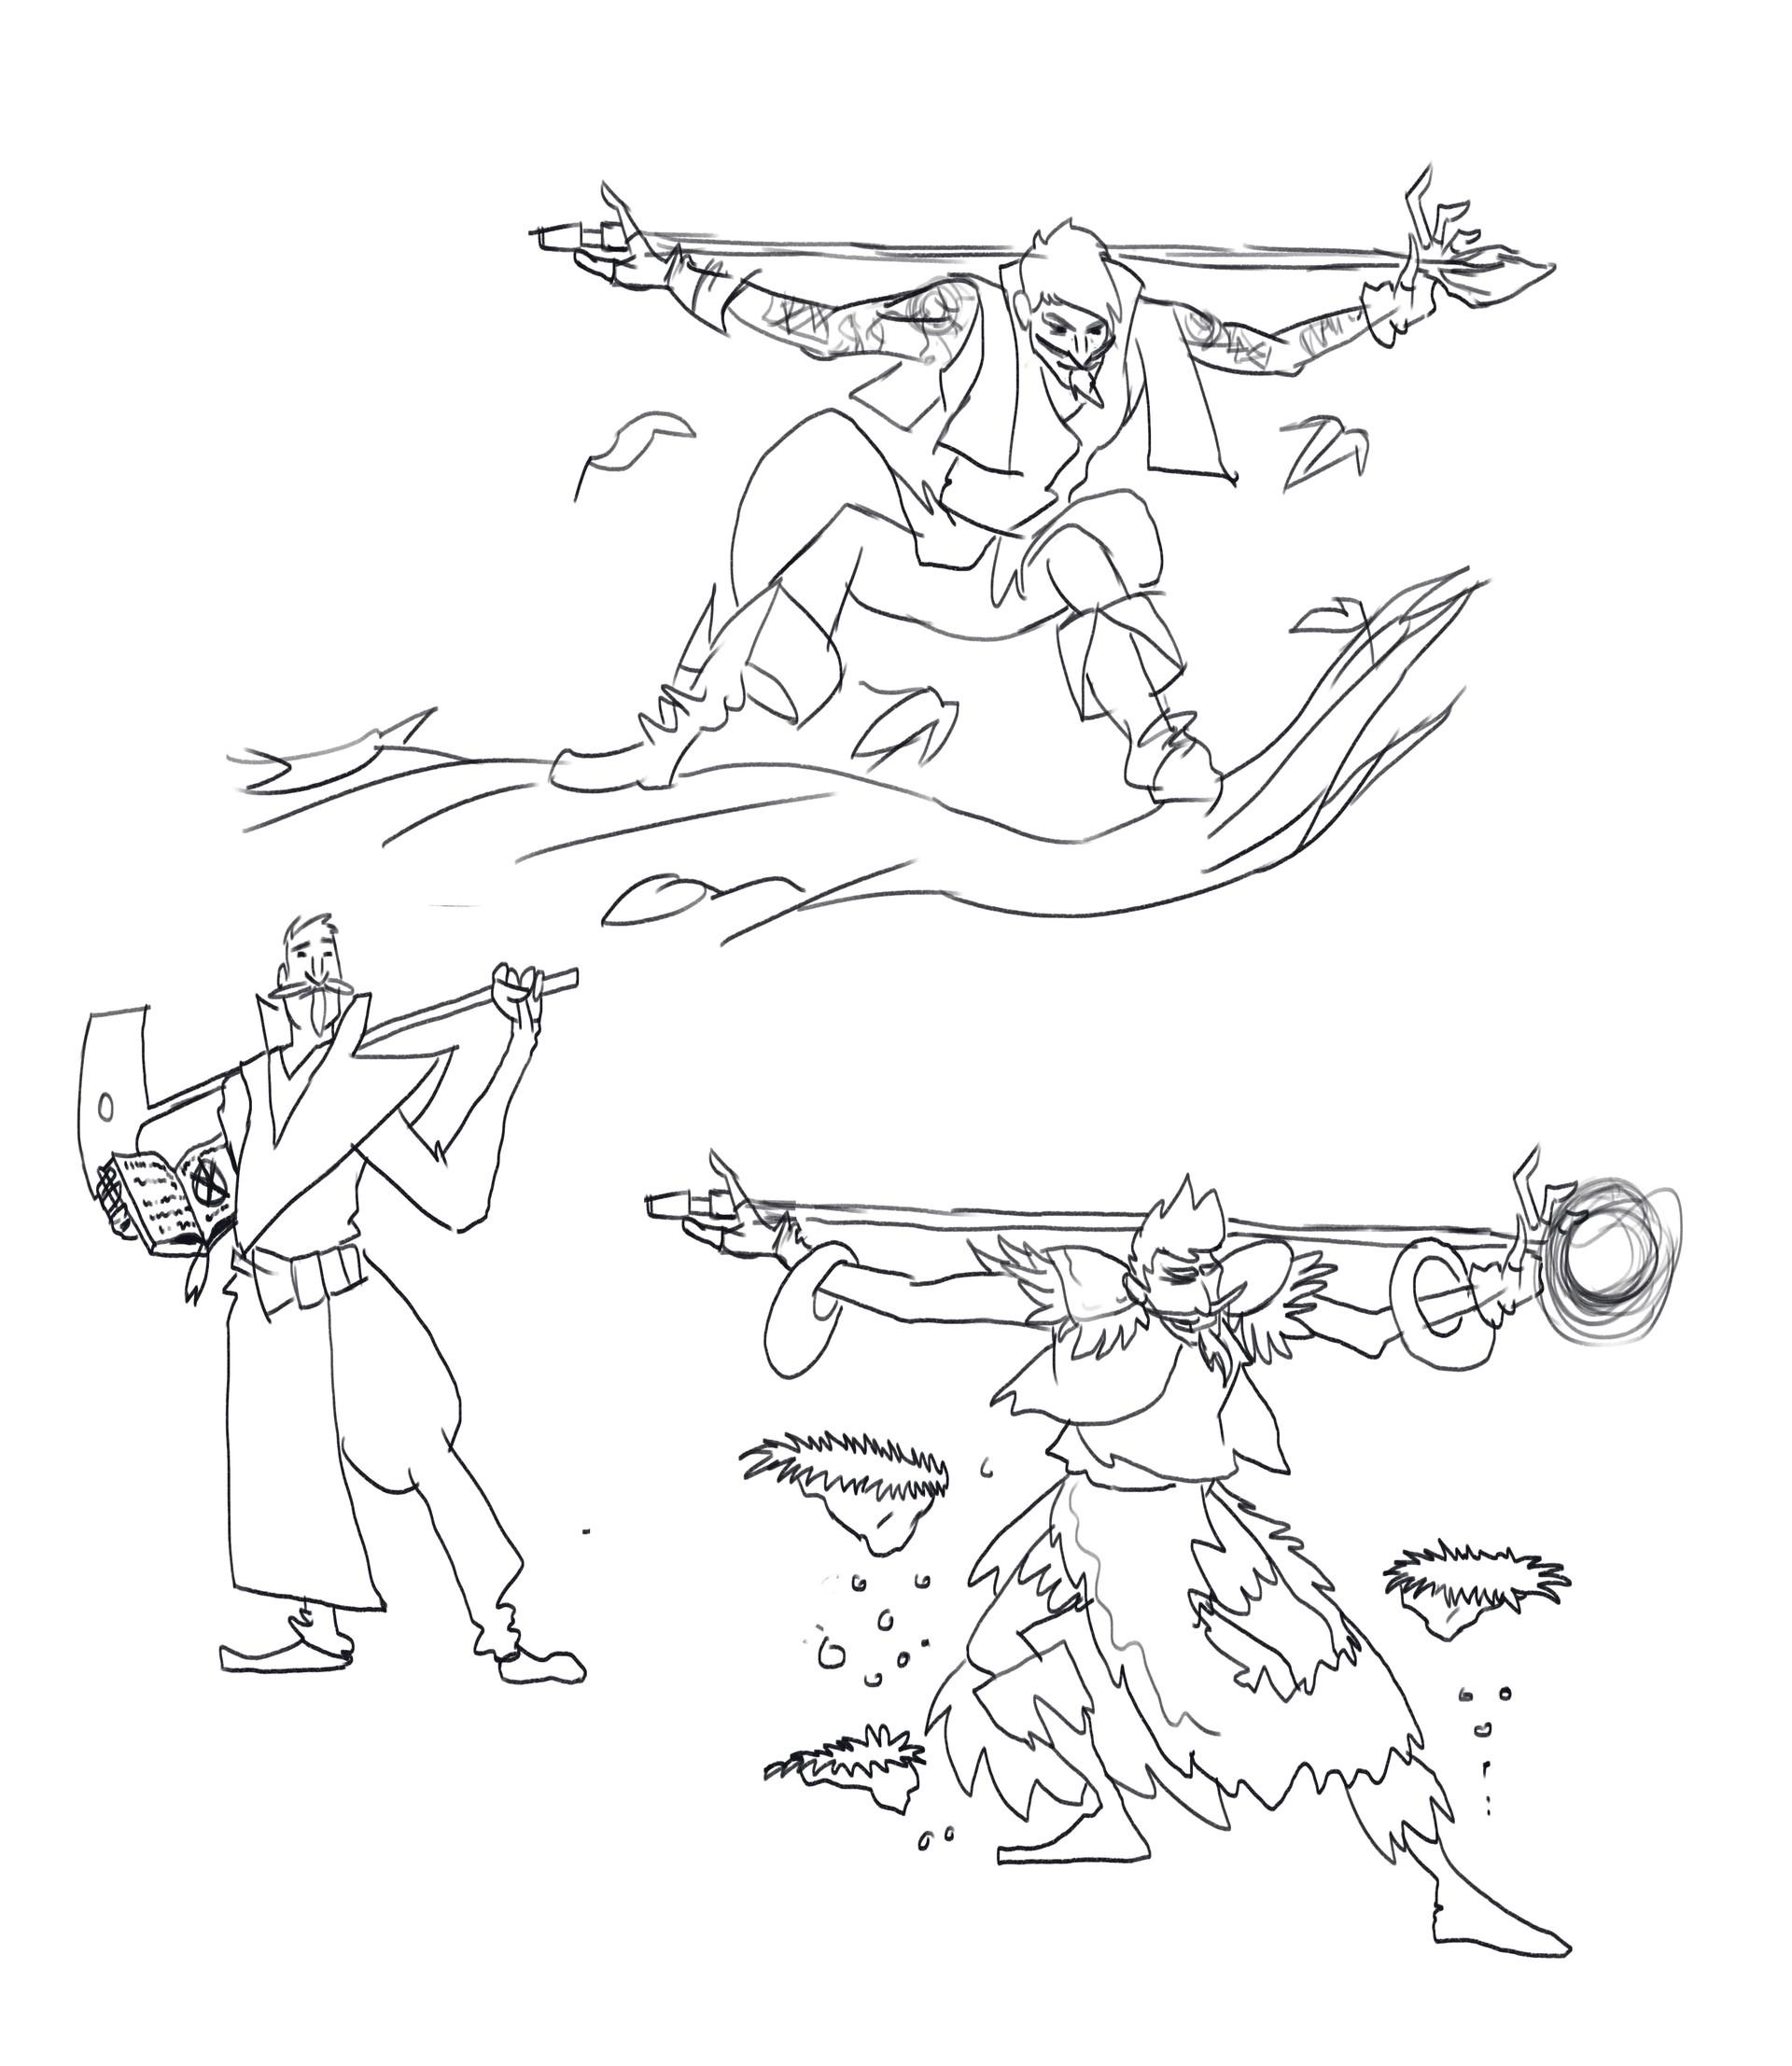 Victor debatisse wizards sketches